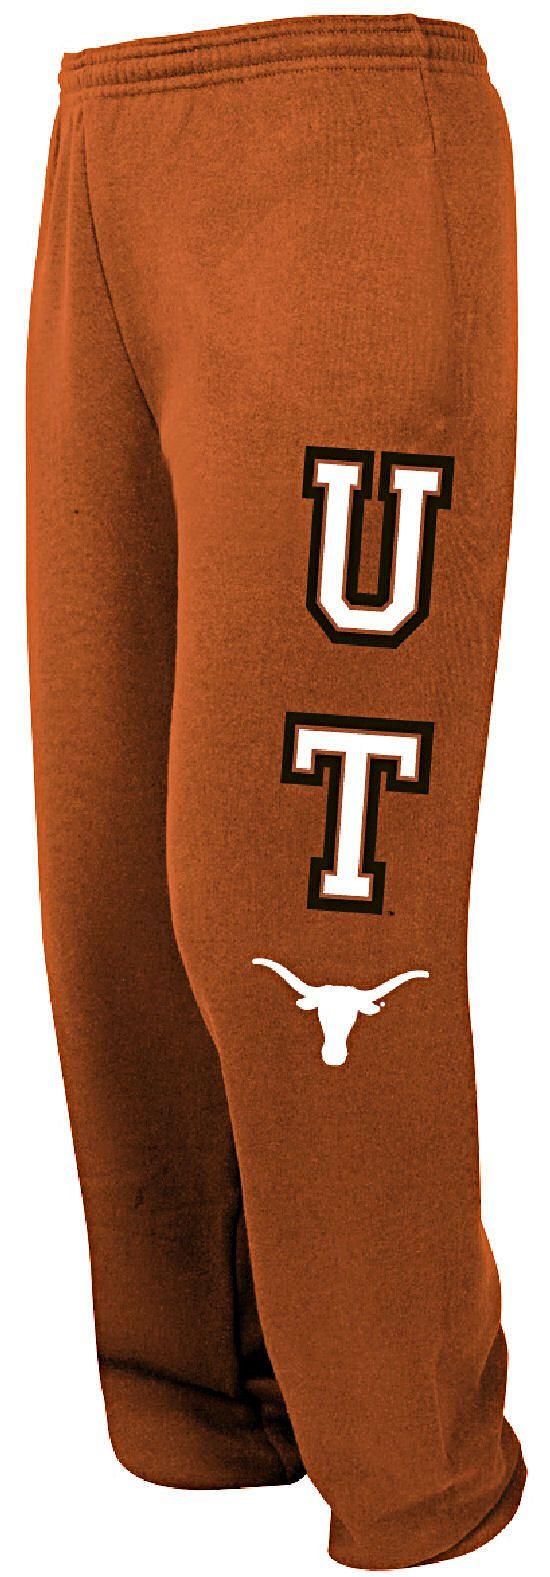 Texas Longhorns Burnt Orange College Sweatpants by Majestic $39.95